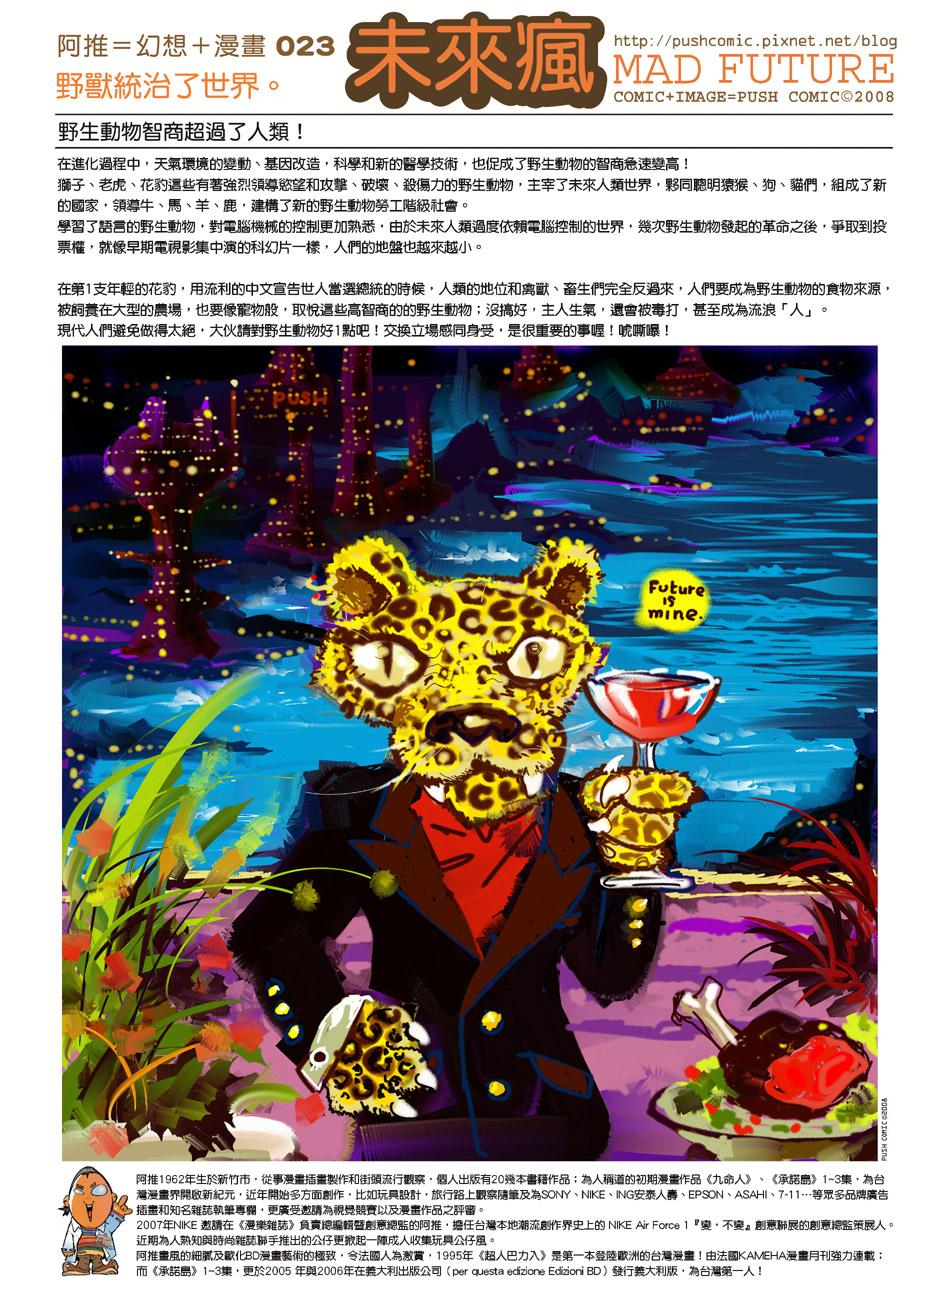 Ming-023-MF-byPUSH-S.jpg